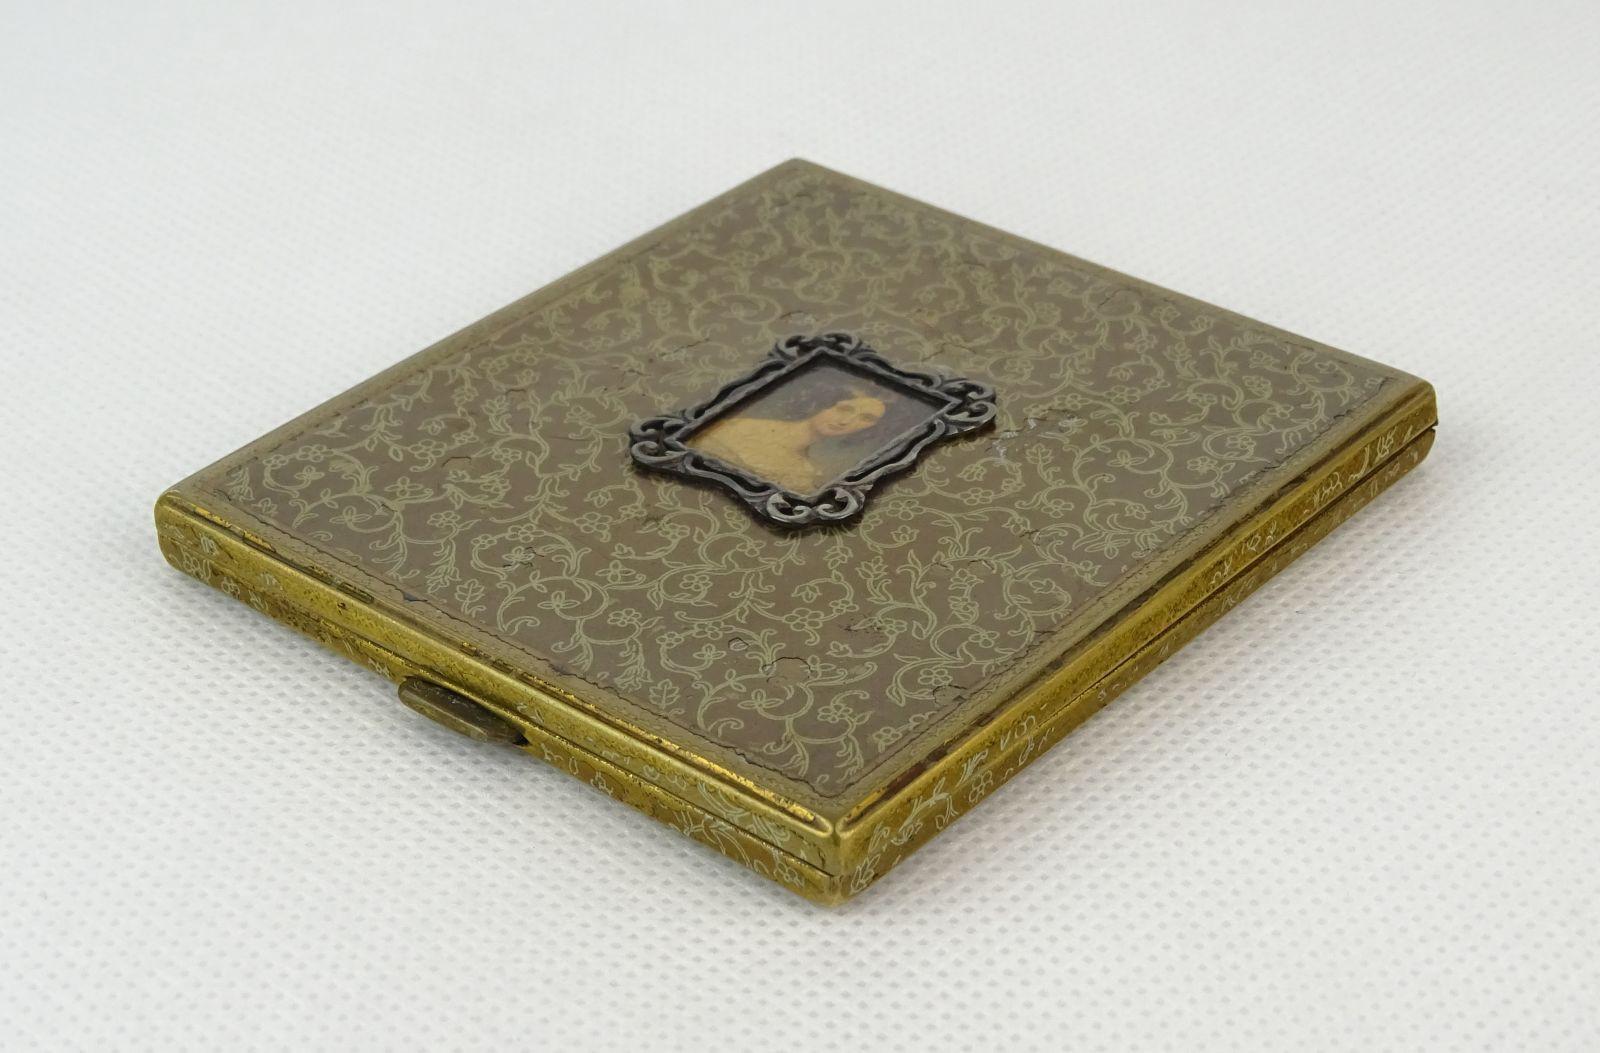 DSC00407.JPG (1600×1053)